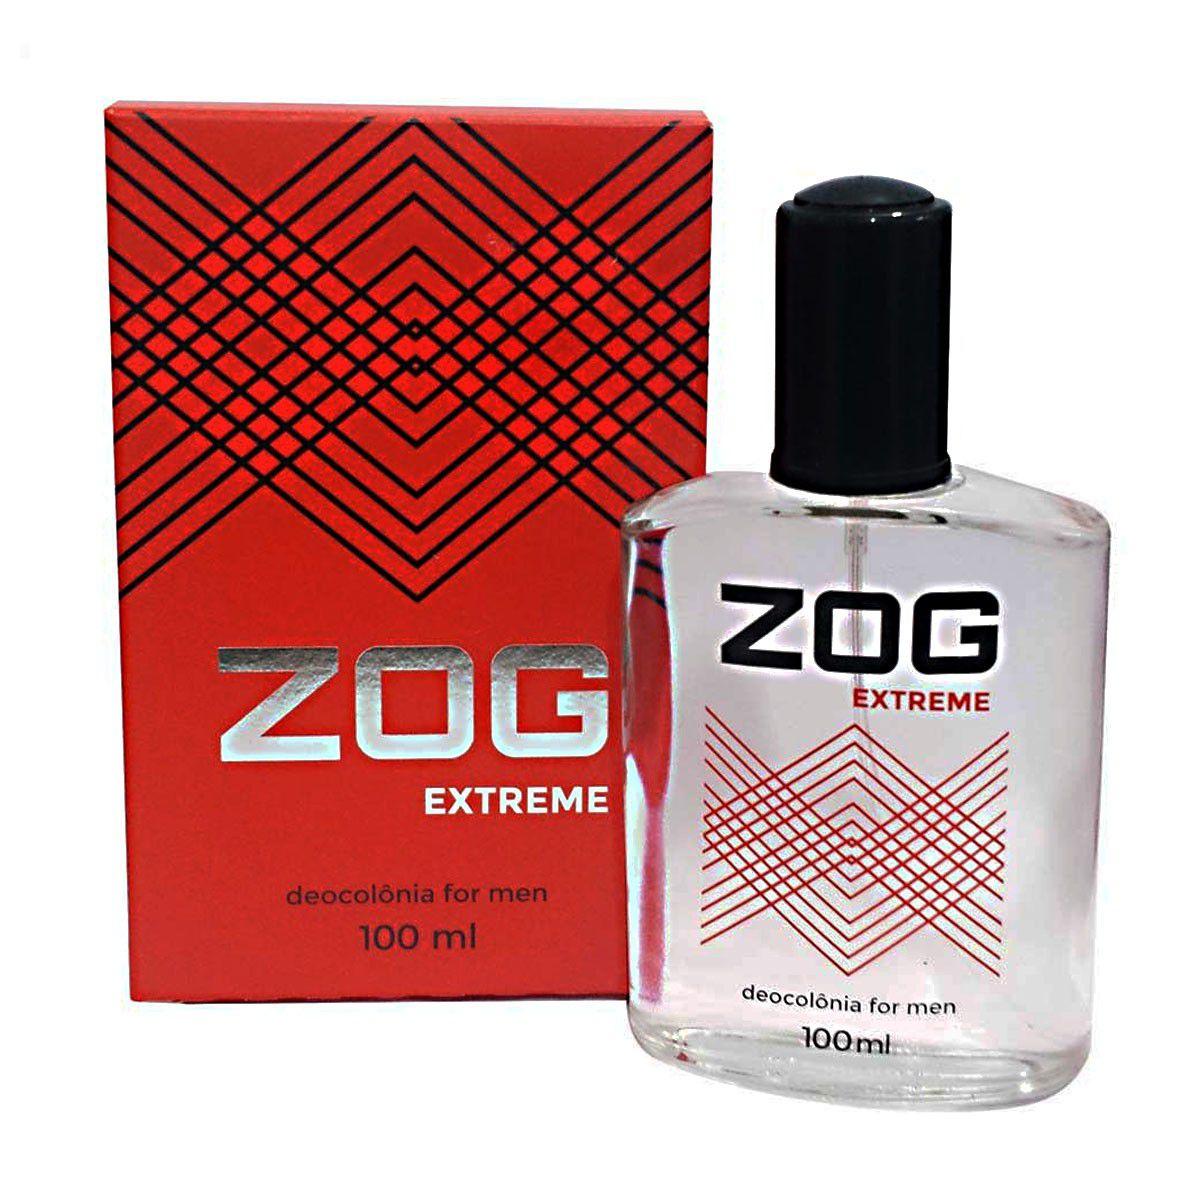 Kit DeoColonia Zog For Men (4-Sport/4-WINE/4-ADVENTURE/4-EXTREME)-16 Colonias+Suporte+Provador